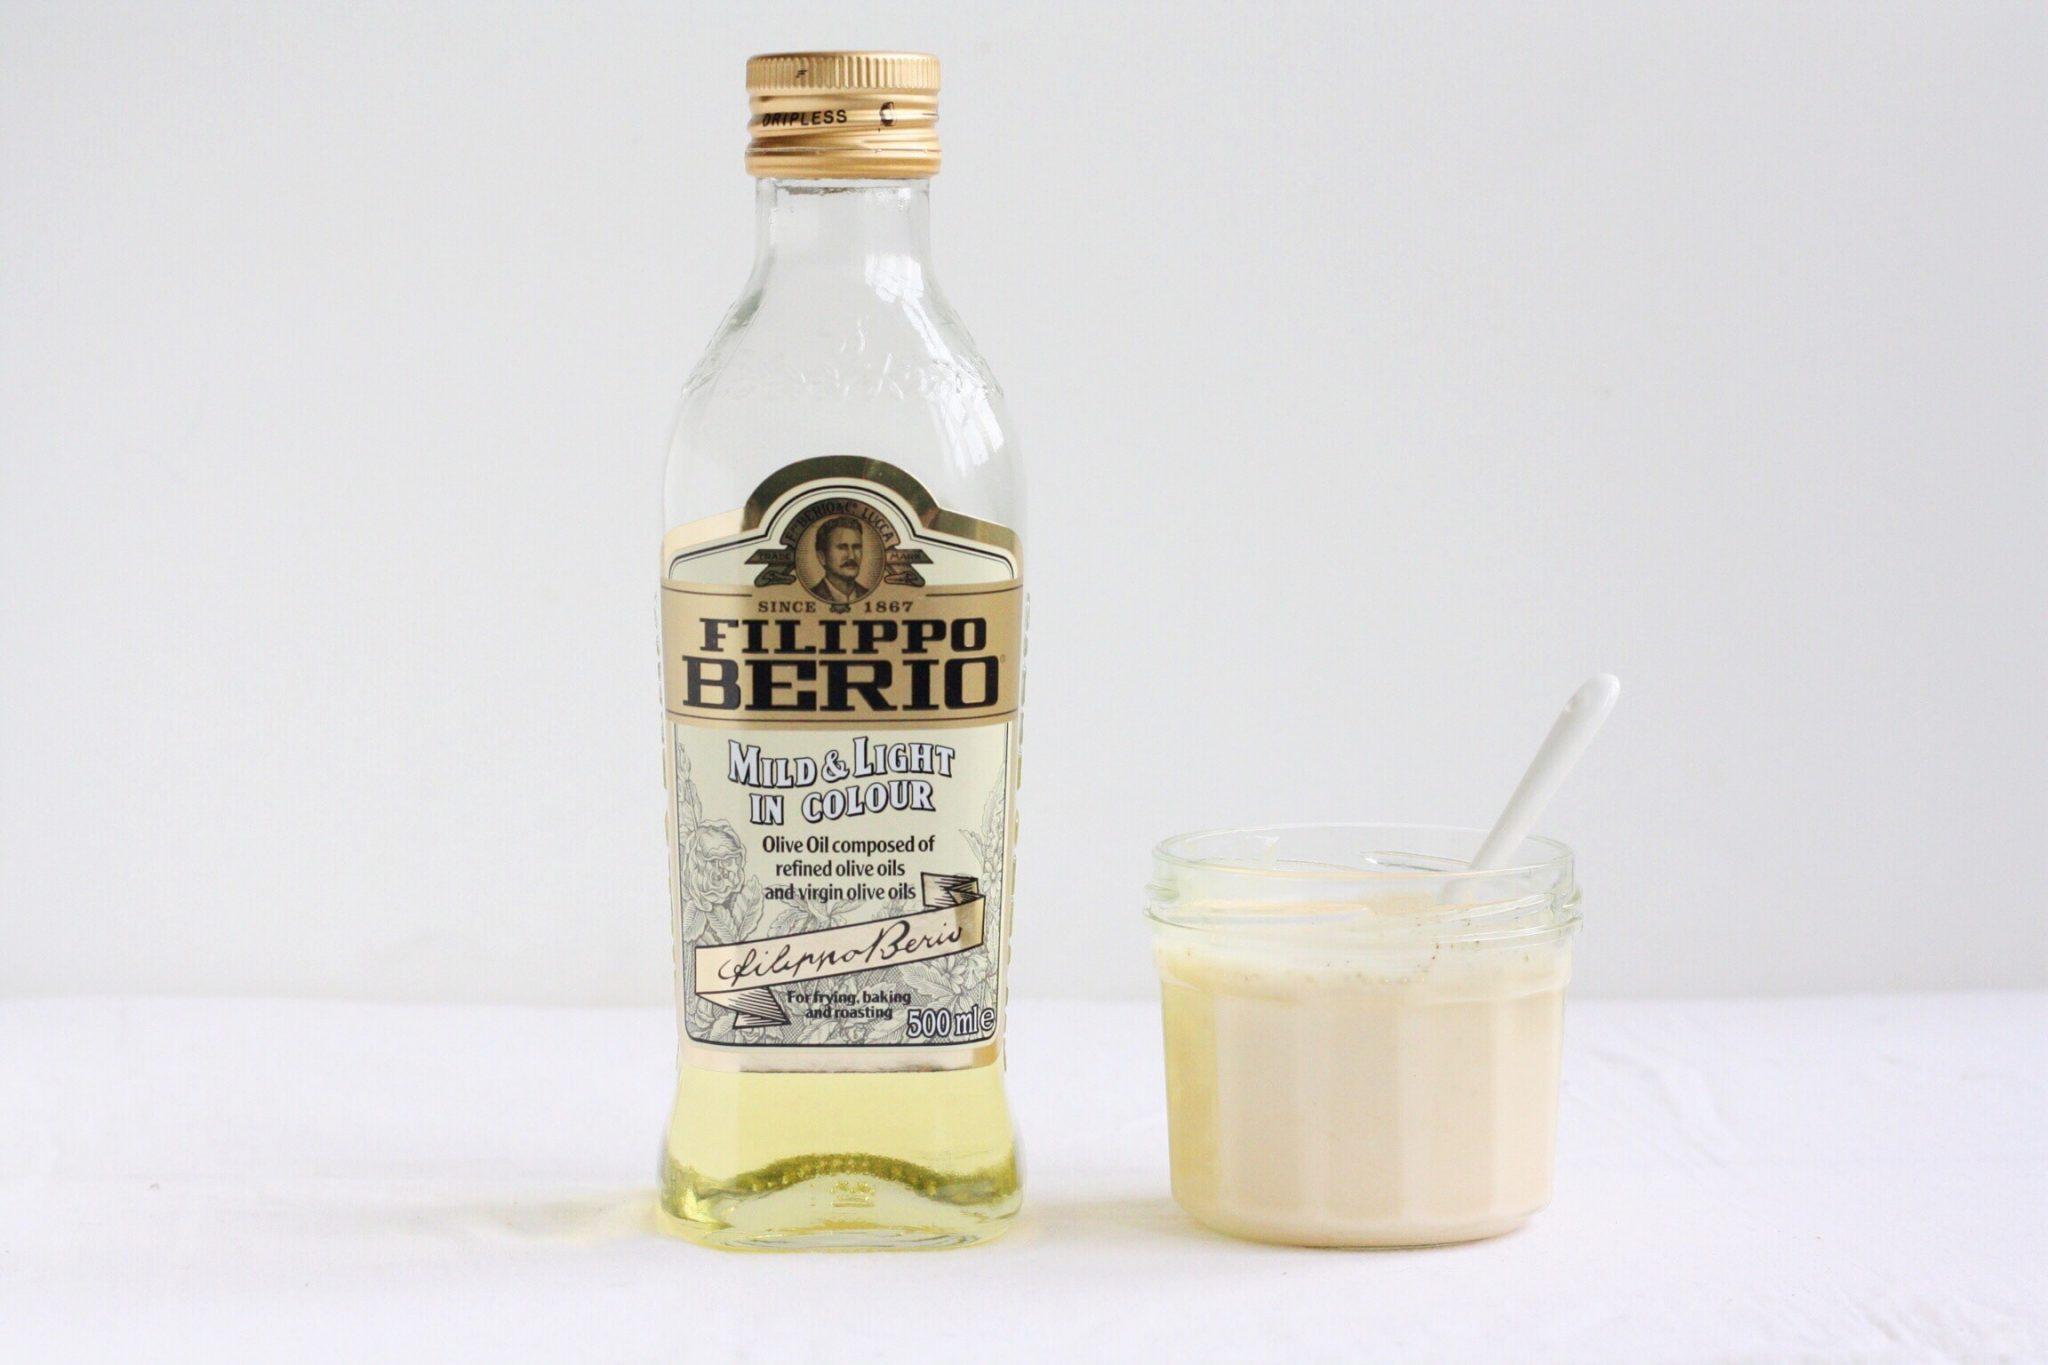 filippo berio mild light culinessa